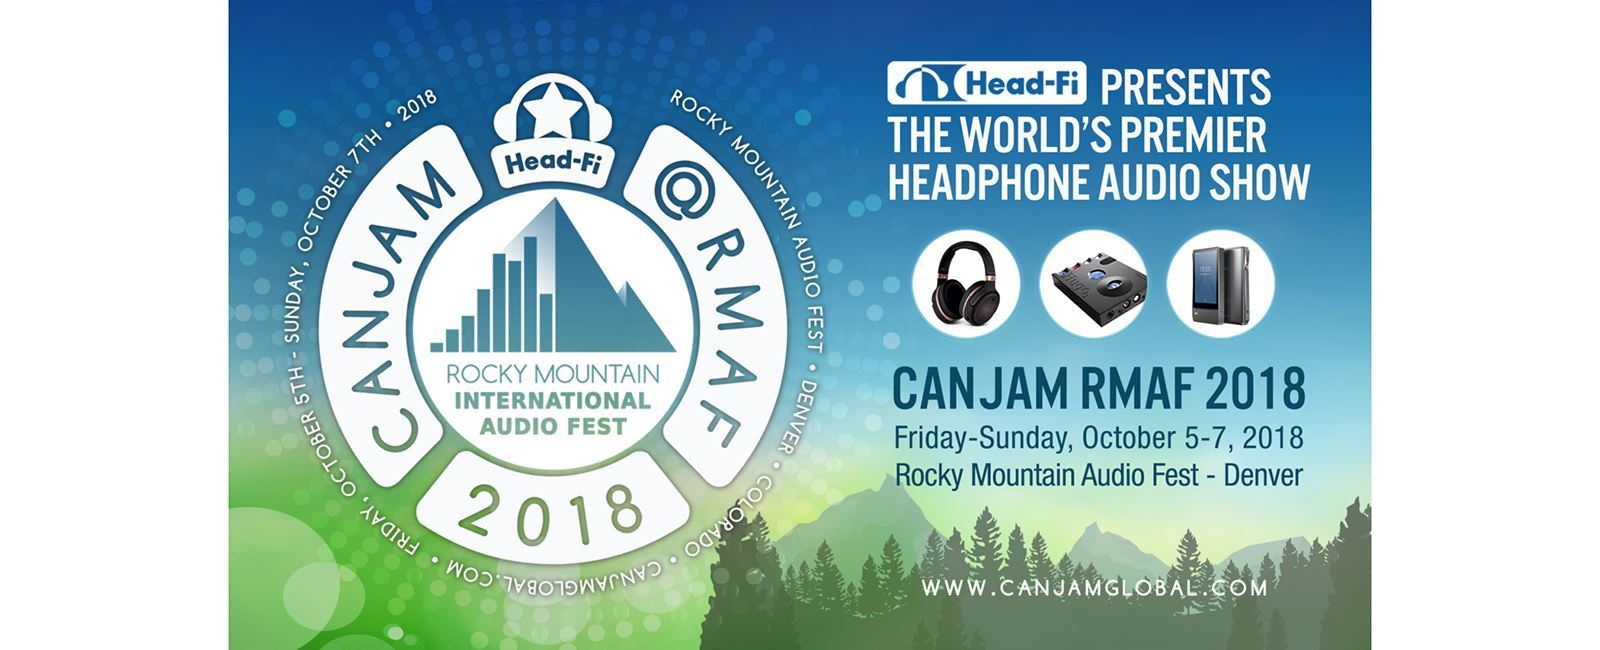 Rocky Mountain Audio Festival 2018